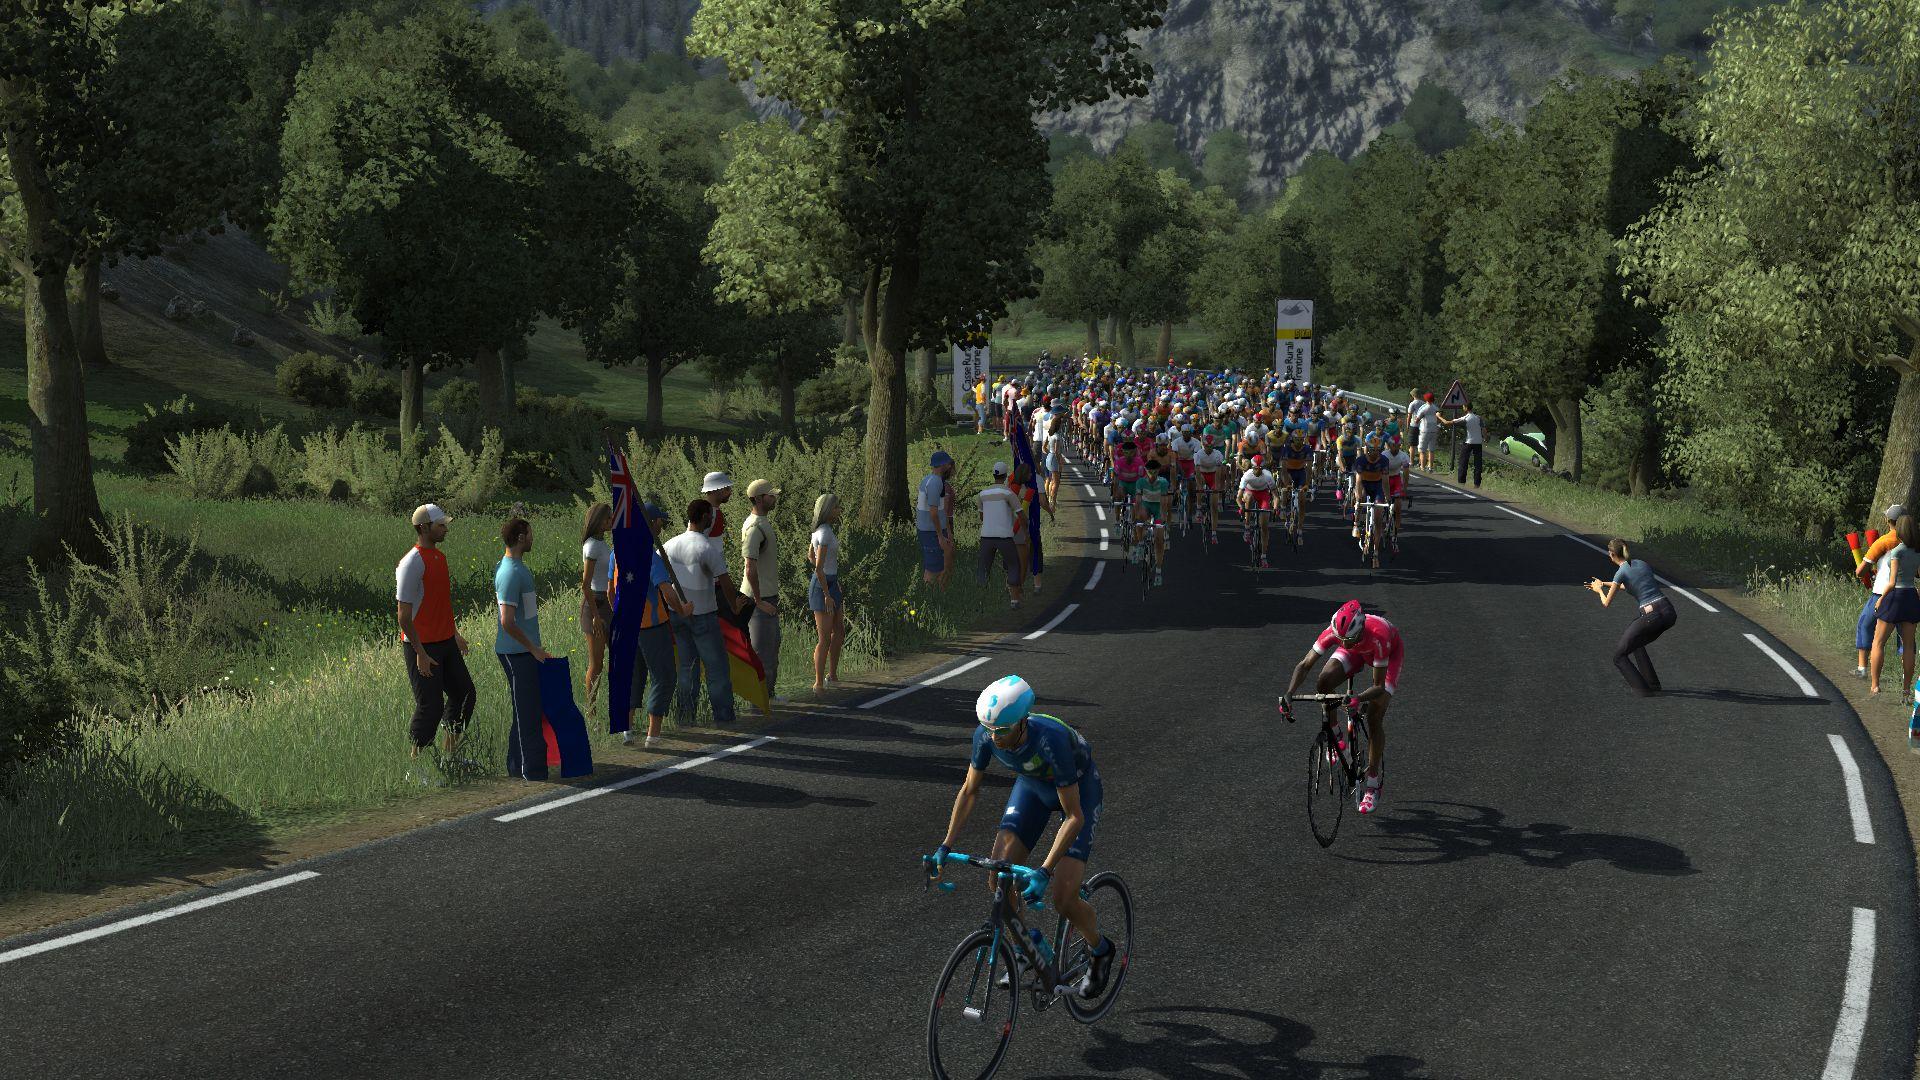 pcmdaily.com/images/mg/2017/Races/CT/Trentino/mg2017_trentino_04_PCM0103.jpg